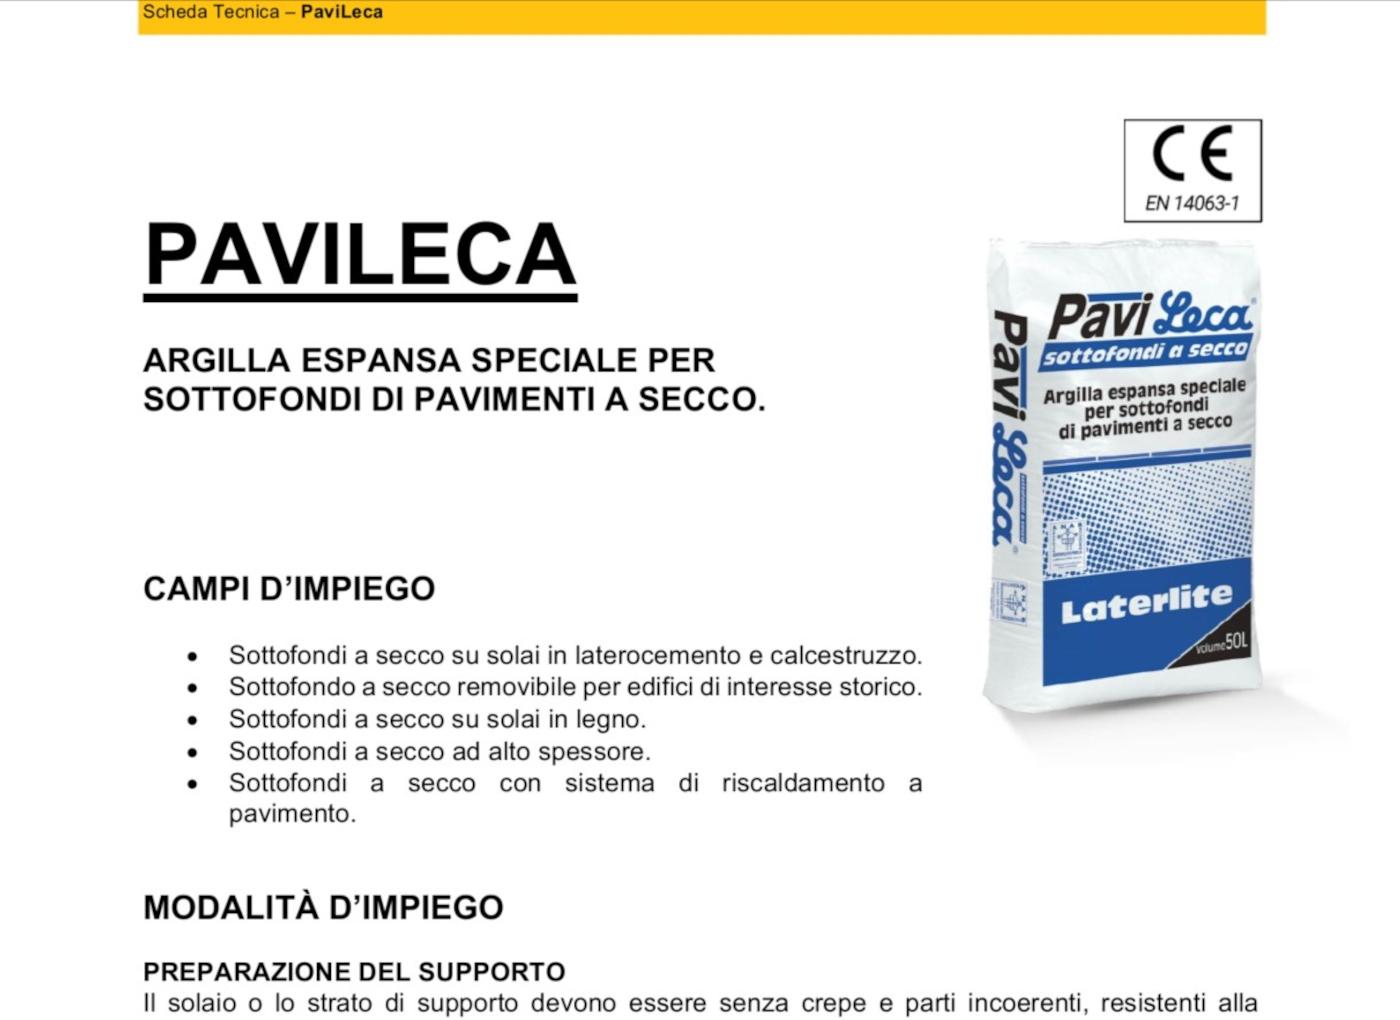 scheda-tecnica-pavileca-P5